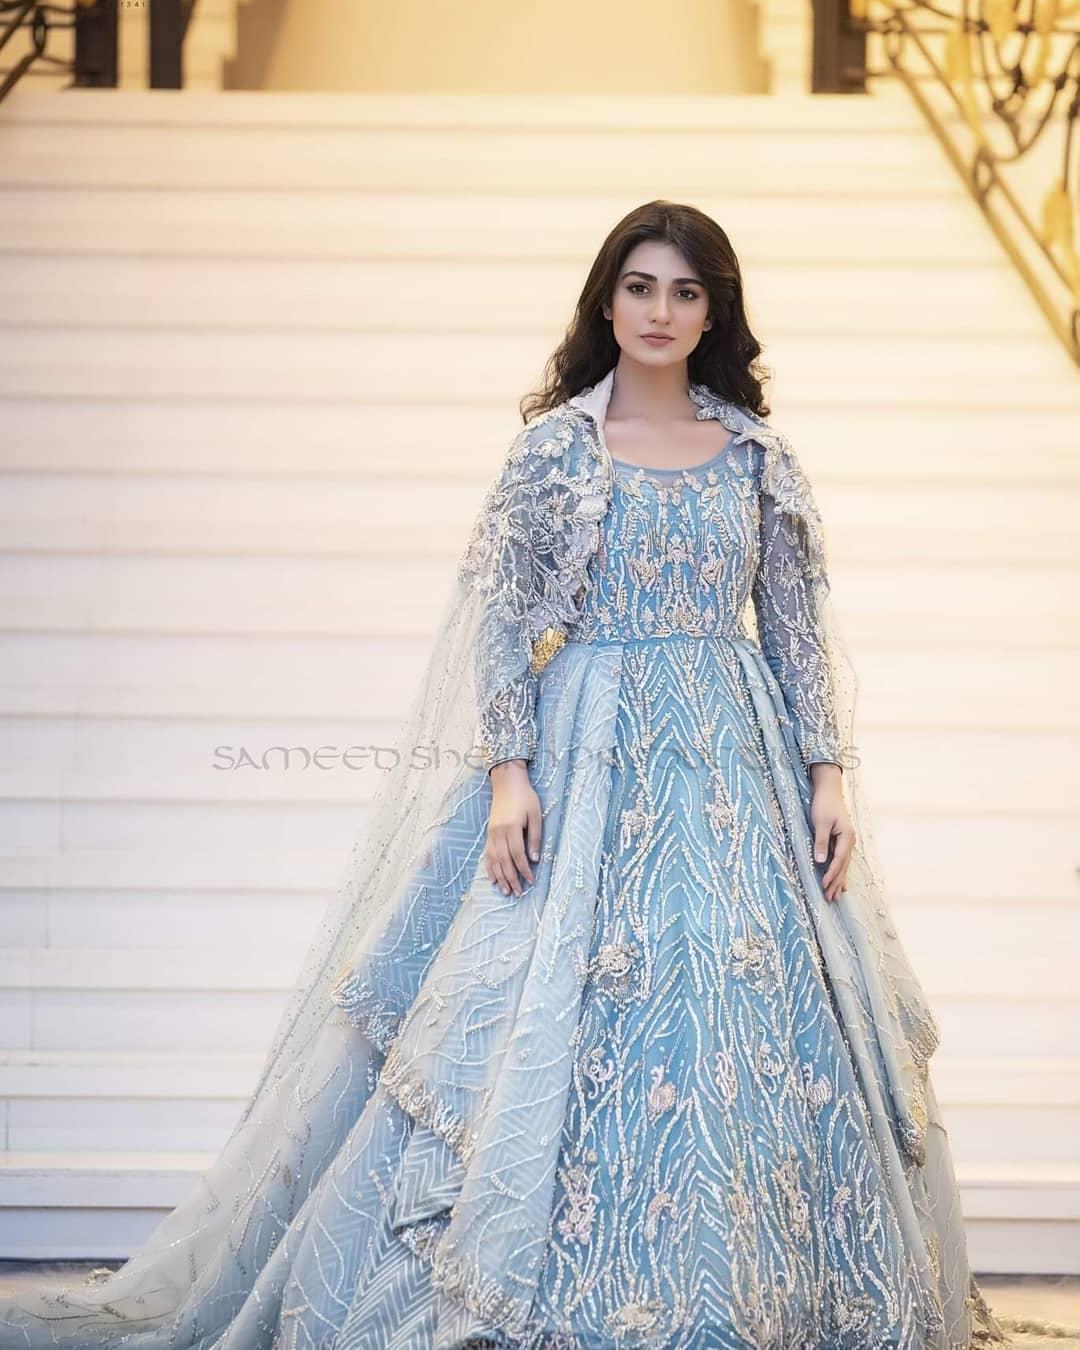 Pakistani Model Sarah Khan Photoshoot (6)